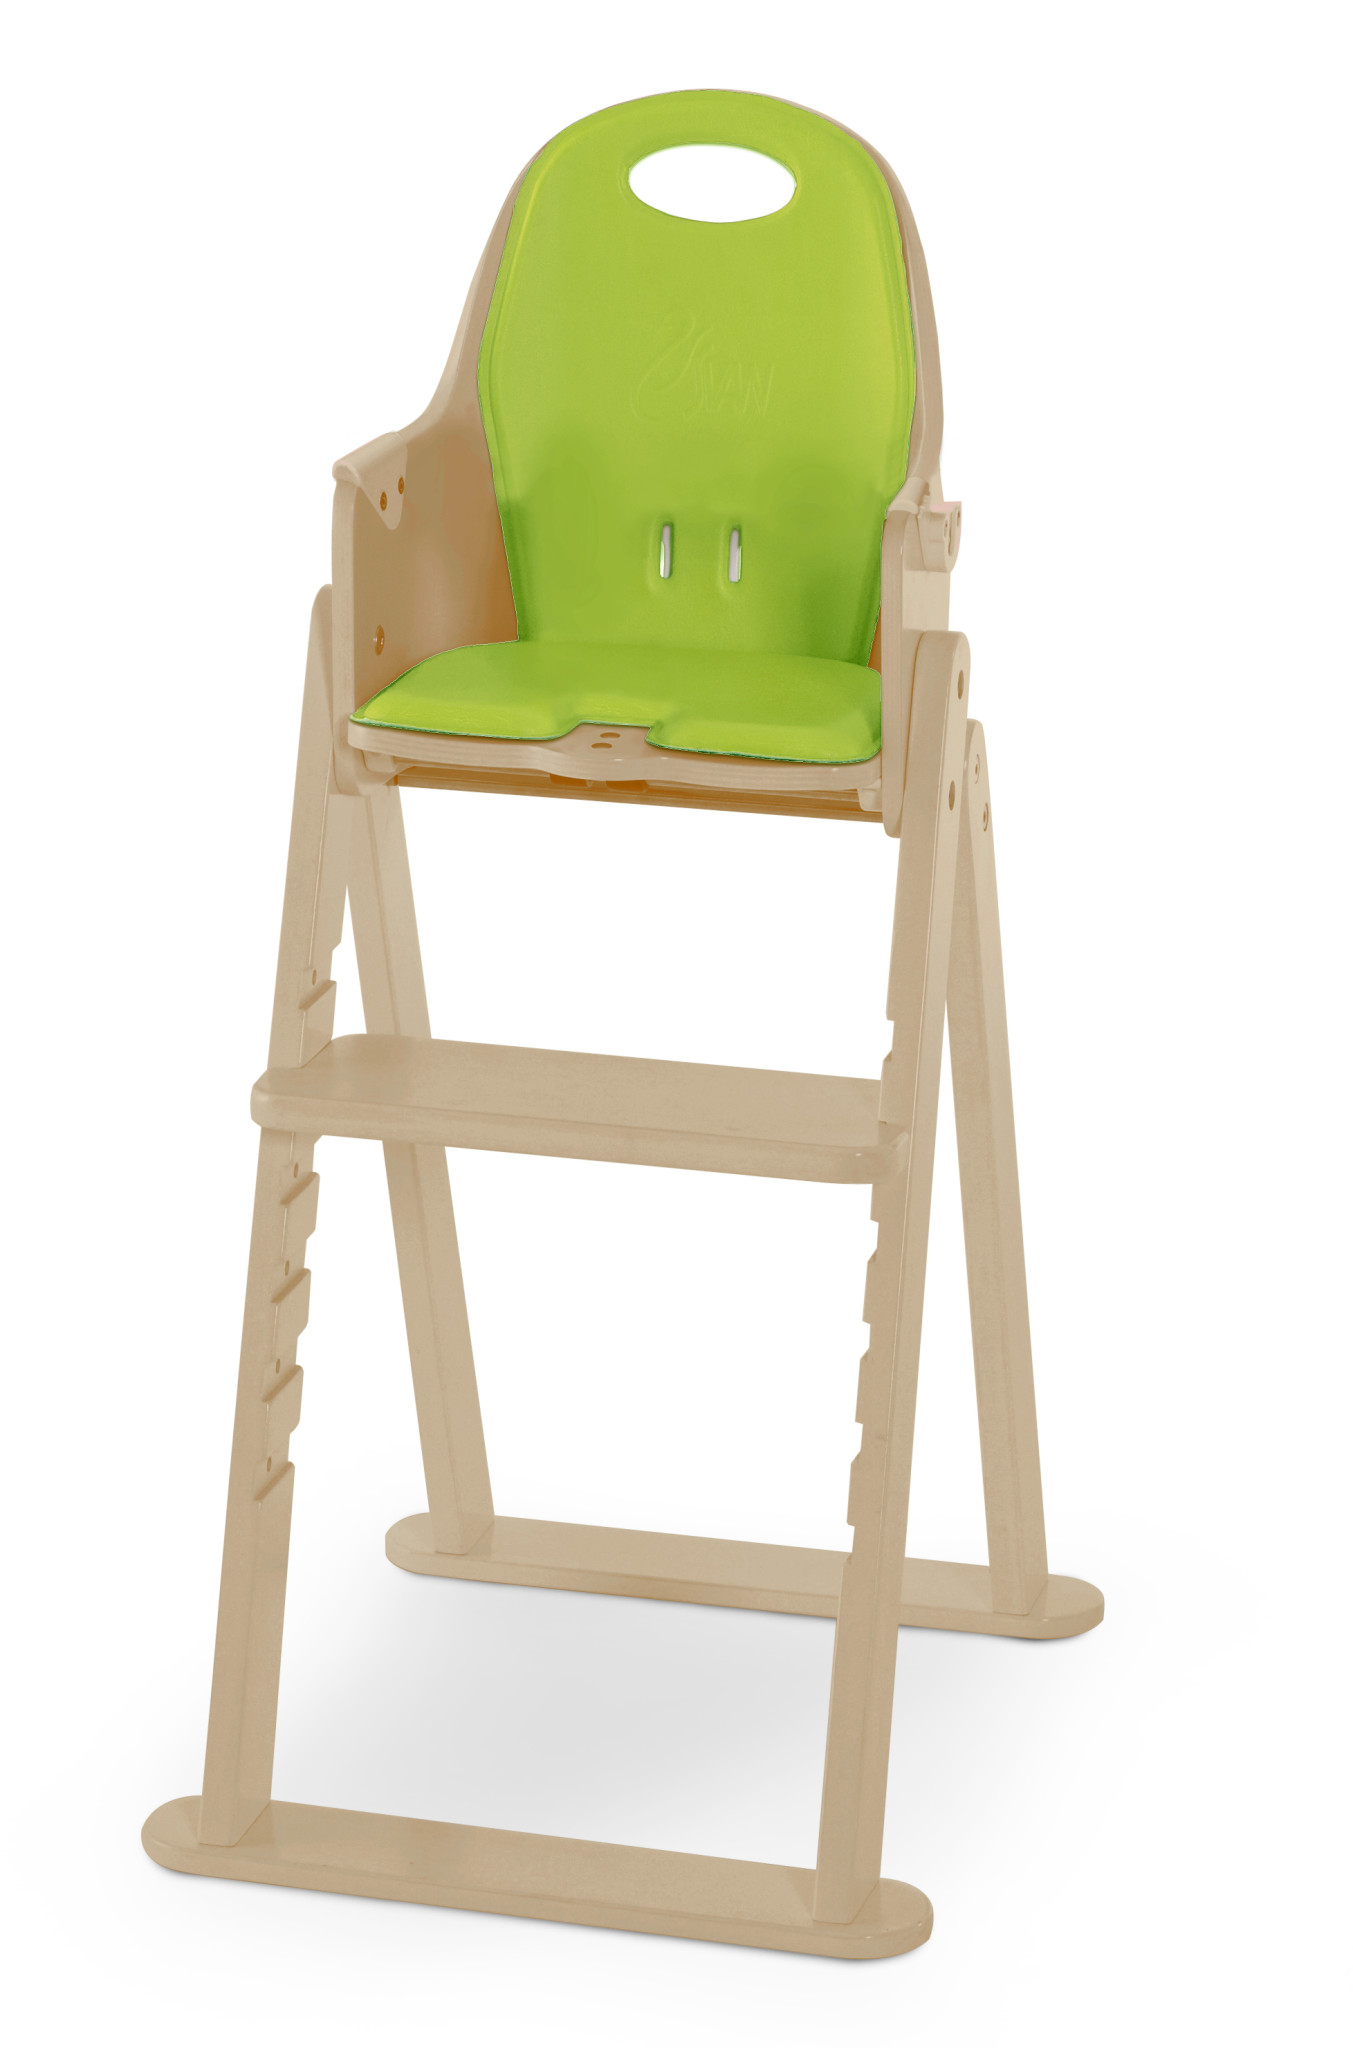 booster high chairs skyline furniture slipper chair fresh tray rtty1